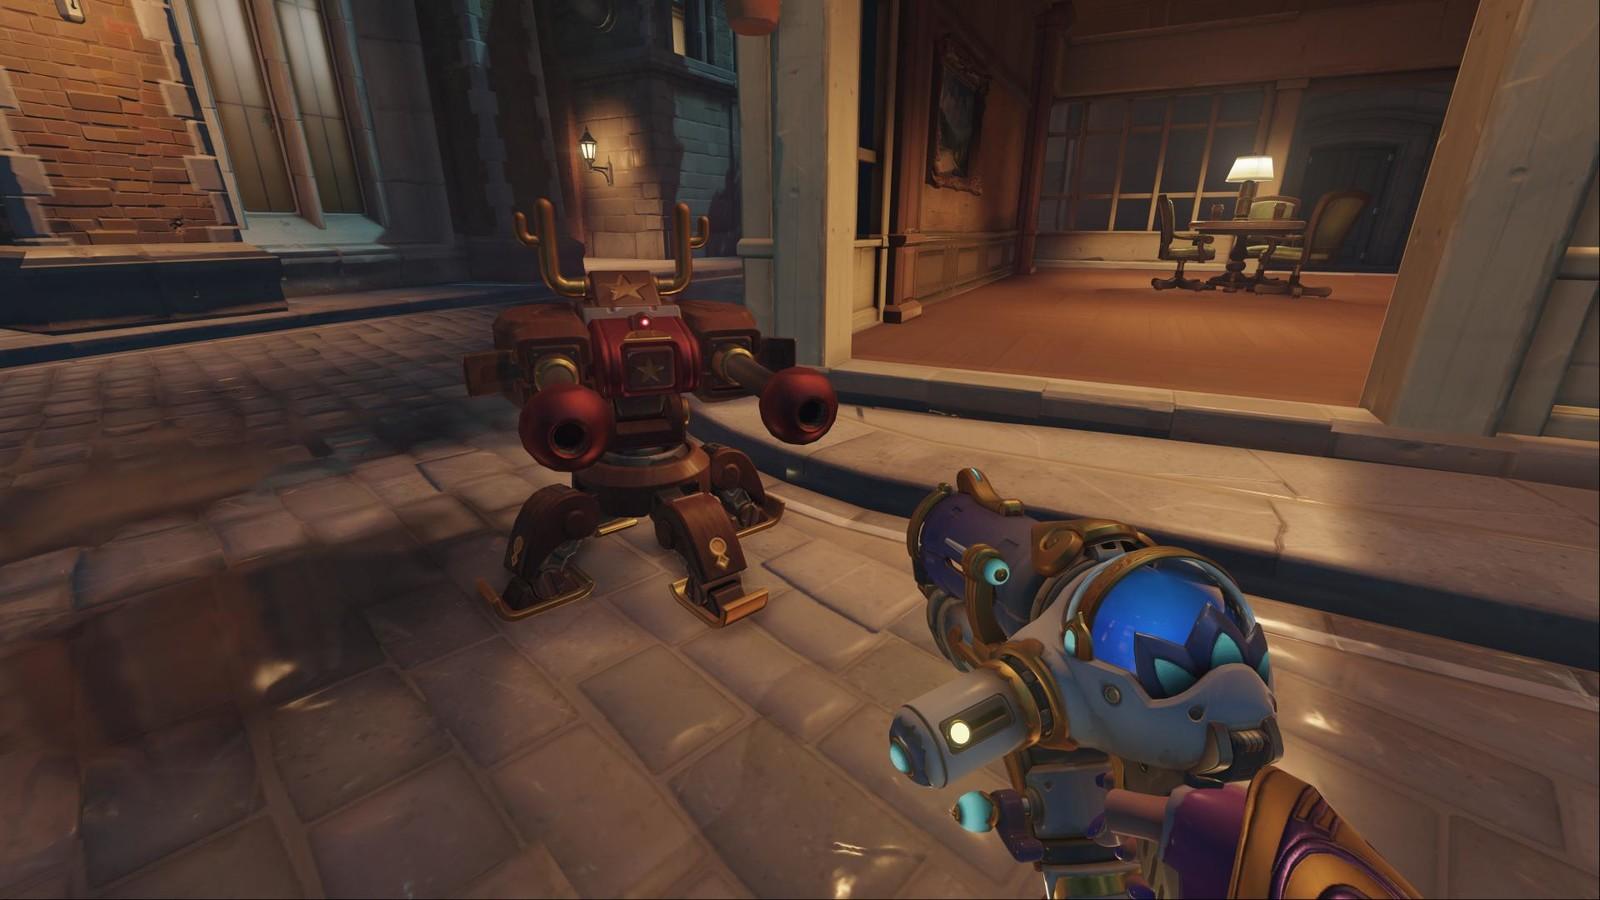 turret level 2 ingame screenshot